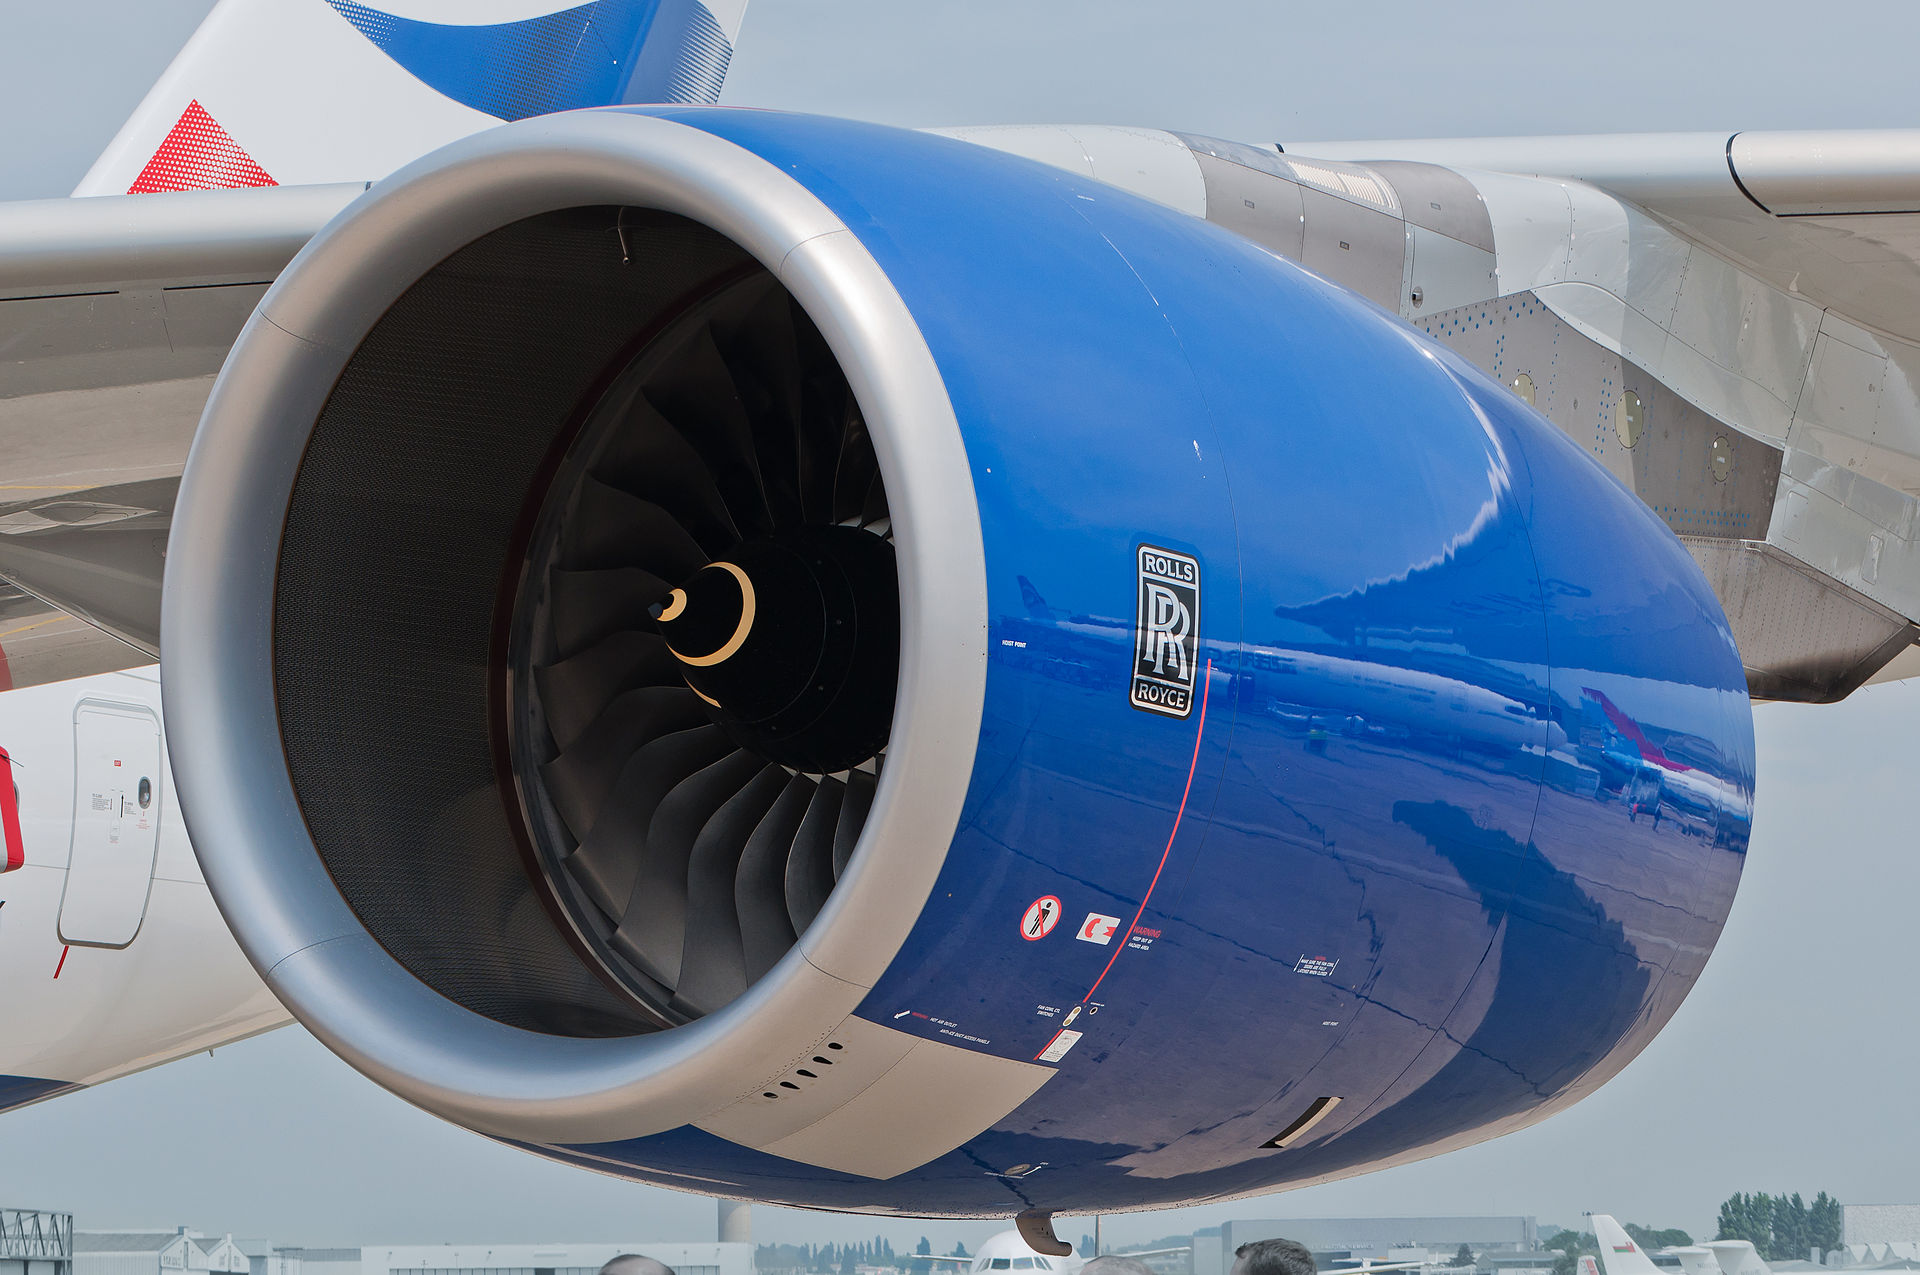 Rolls Royce Trent Wikipedia